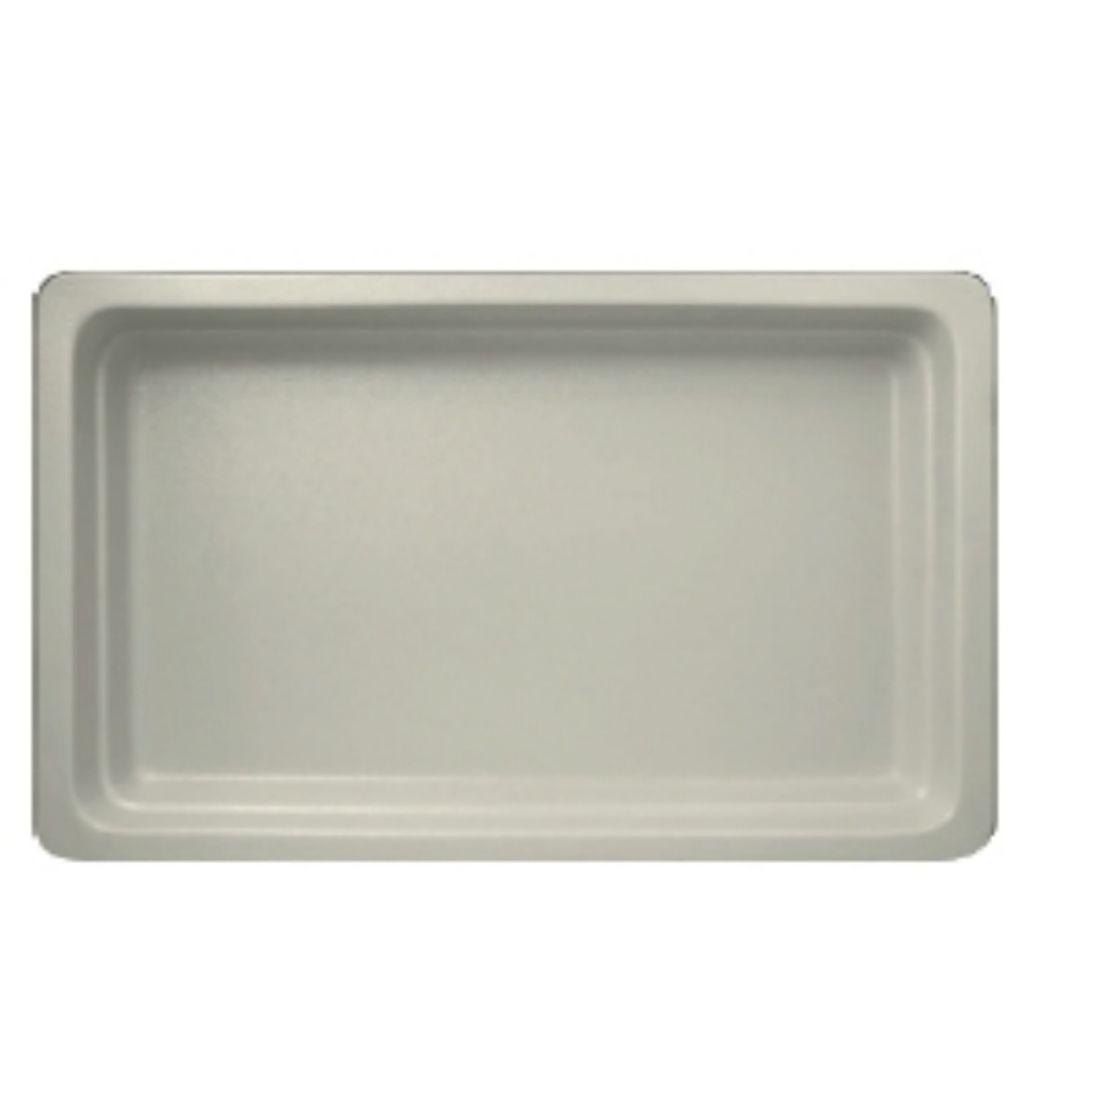 Gastronádoba porcelánová Neofusion GN 1/1 22 mm bílá mat